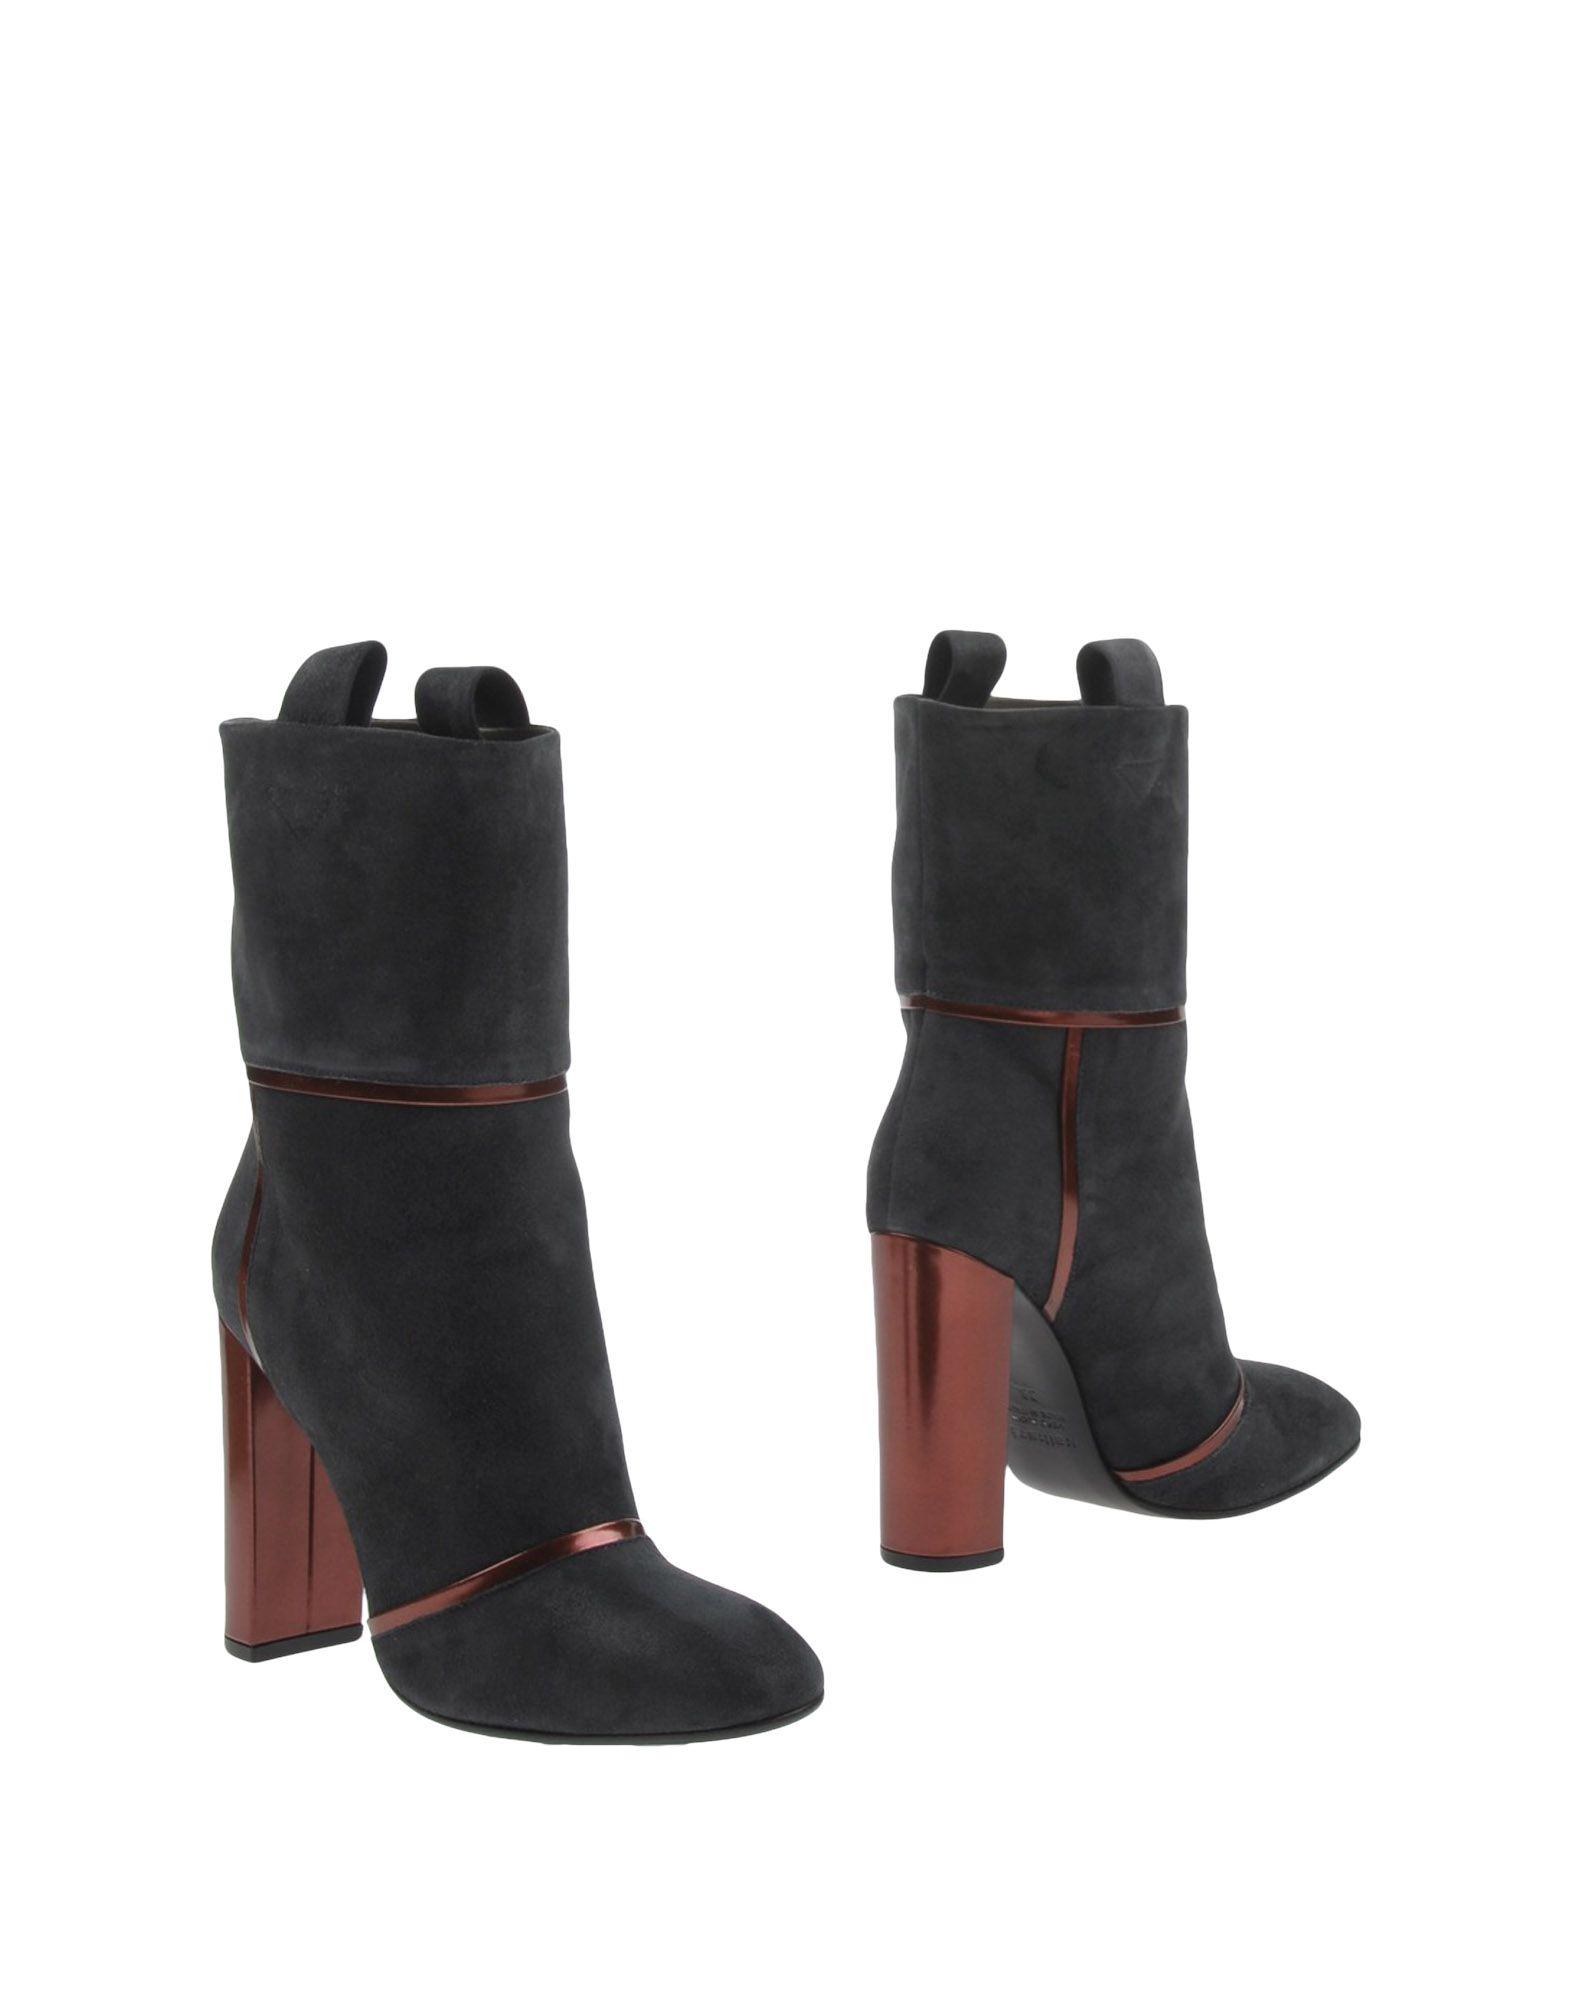 KALLISTÈ Полусапоги и высокие ботинки kallistè полусапоги и высокие ботинки